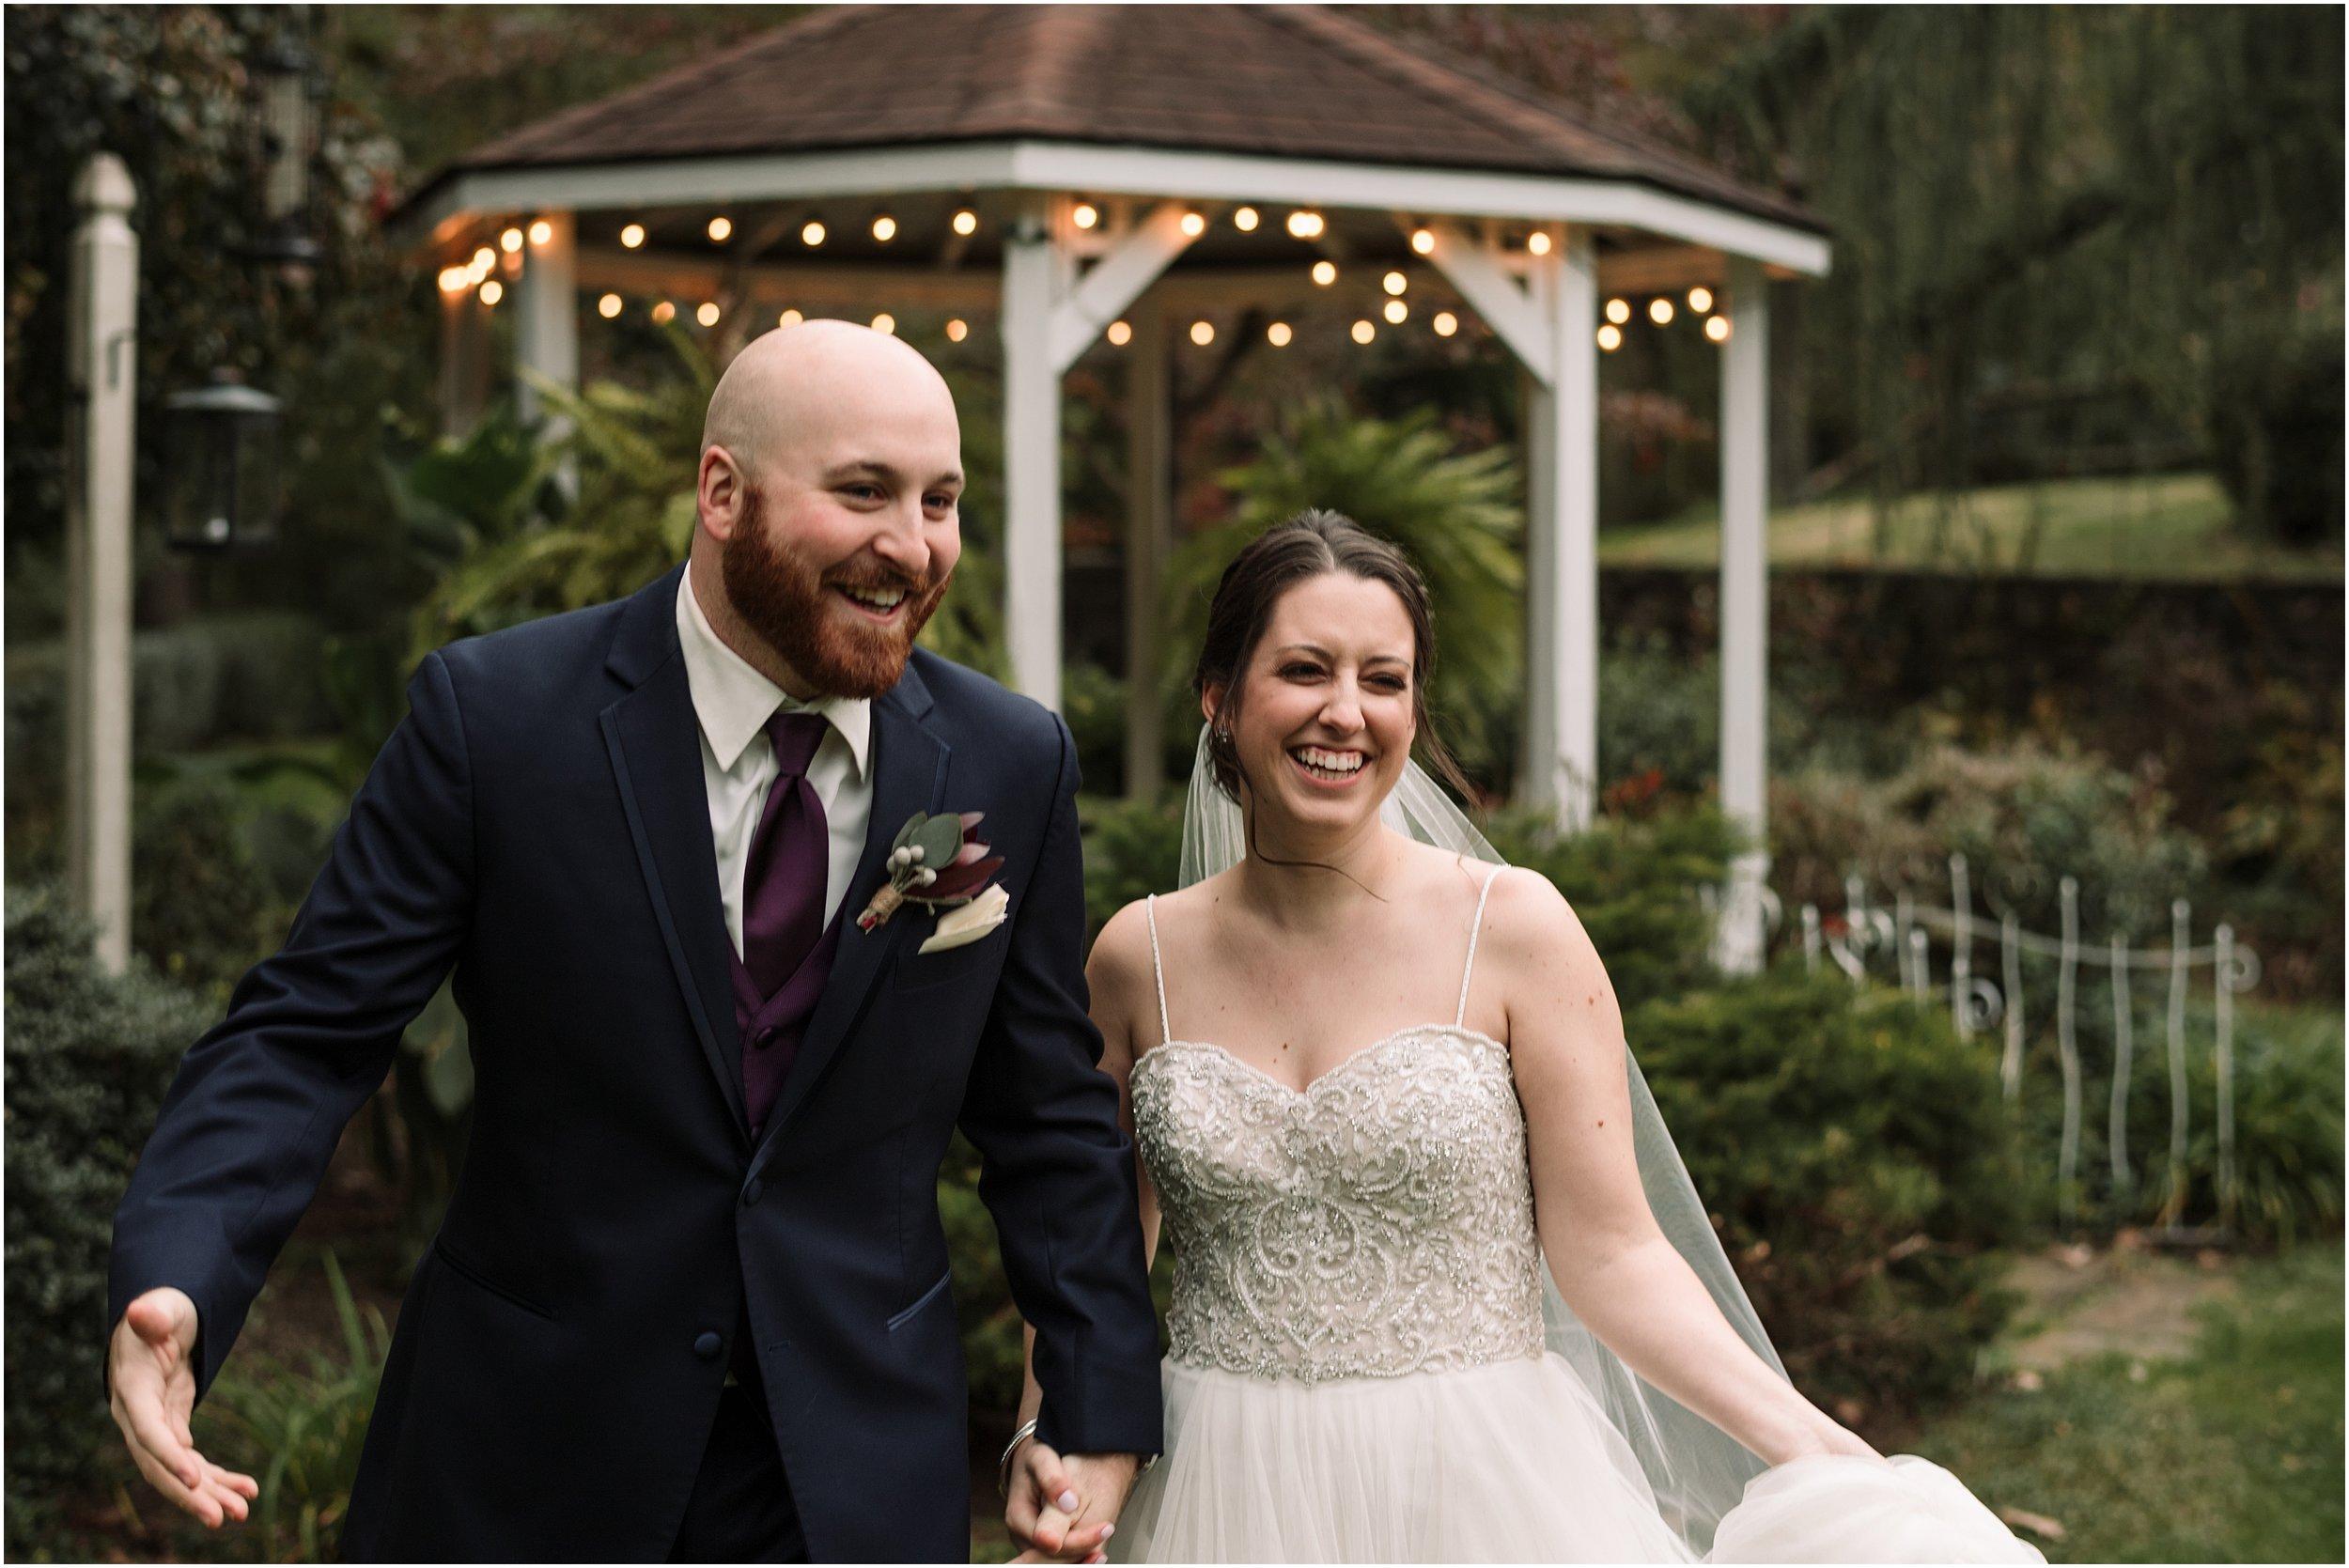 hannah leigh photography riverdale manor wedding lancaster pa_2020.jpg